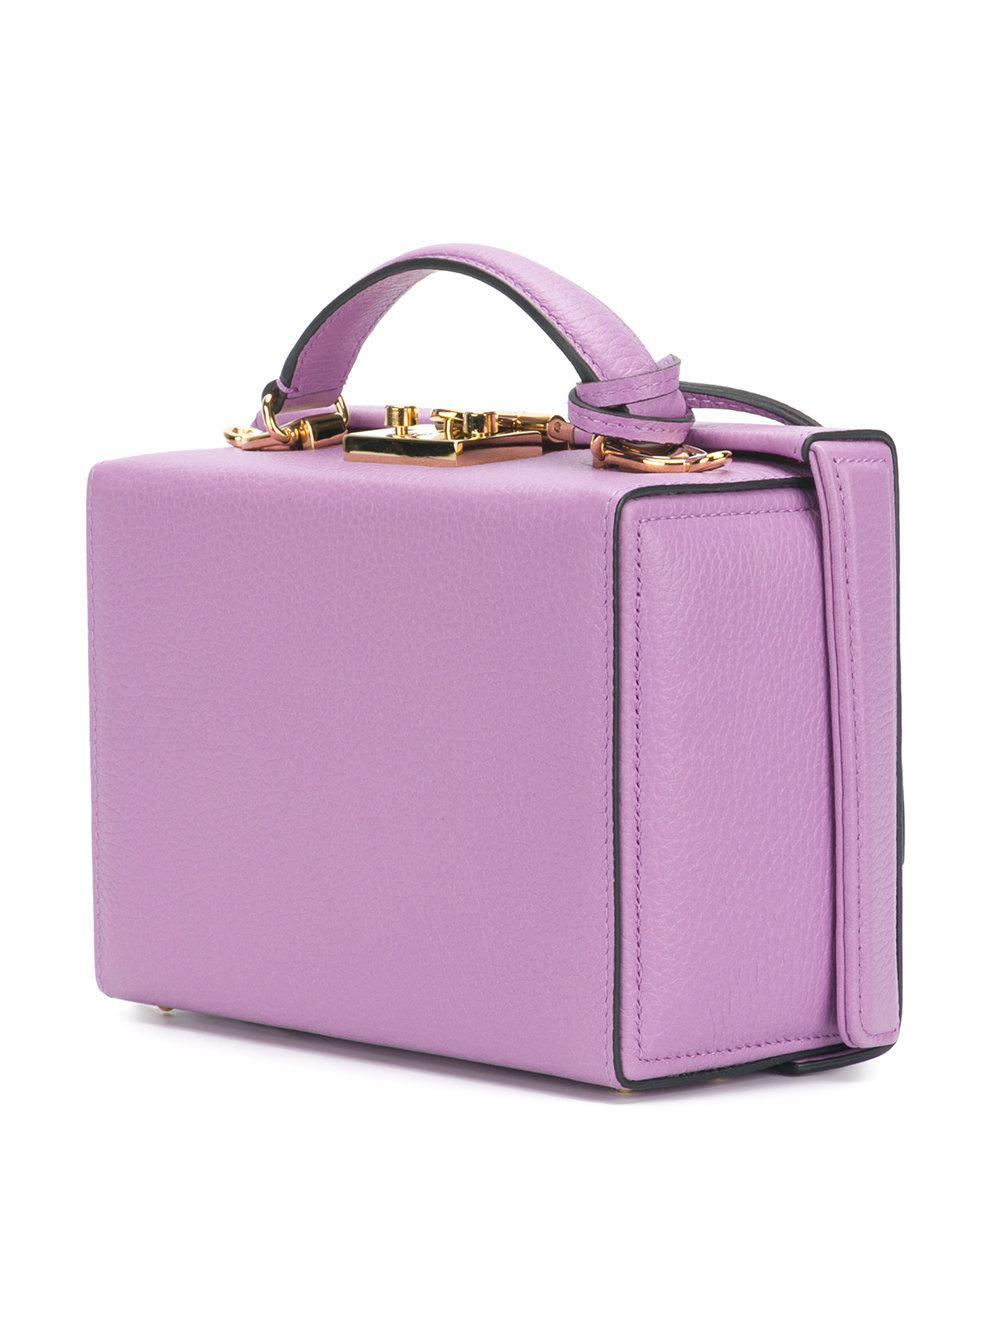 mini box bag - Pink & Purple Mark Cross pkuuQxv